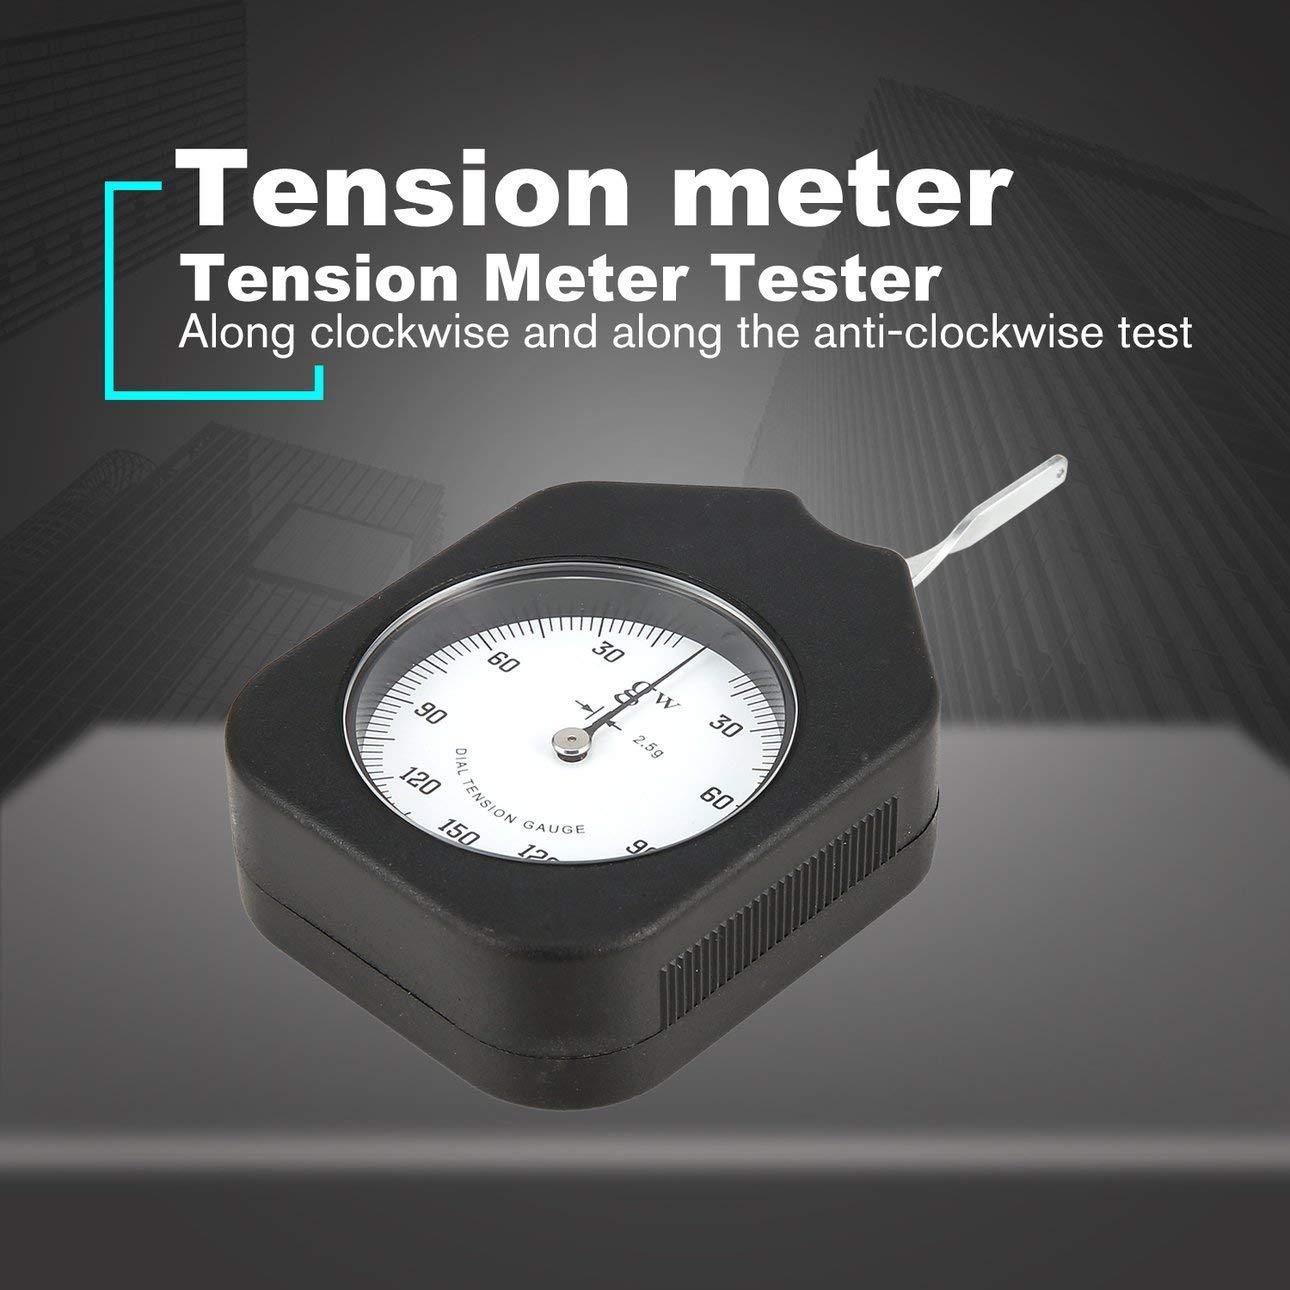 Ballylelly 150g Analog Tensi/ómetro Precio con el Puntero Sola Rueda de tensi/ón del calibrador del Metro Tester Tabular dinam/ómetro Metros tensi/ón Lateral